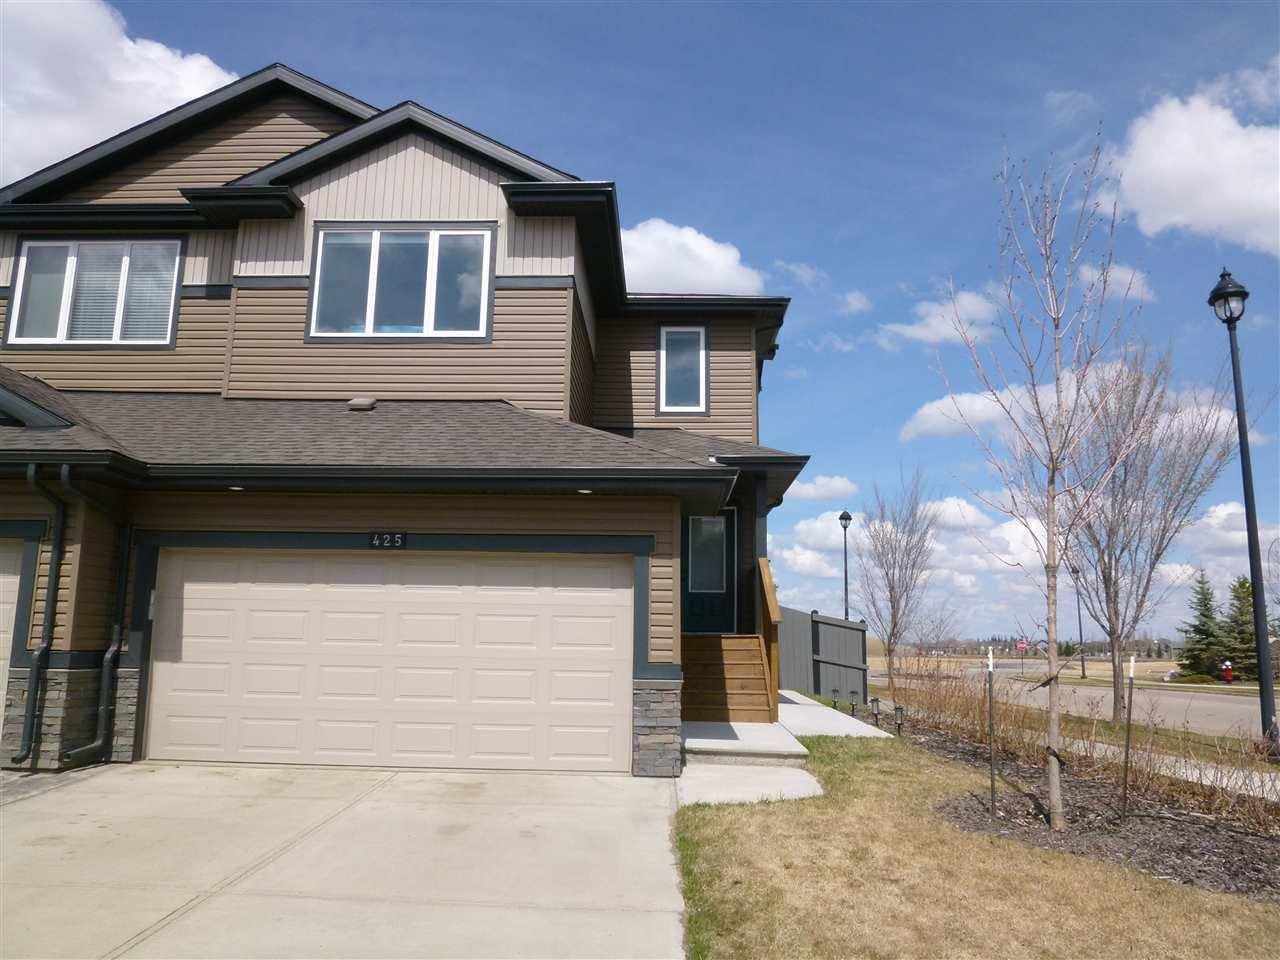 Main Photo: 425 GENESIS Court: Stony Plain House Half Duplex for sale : MLS®# E4196079